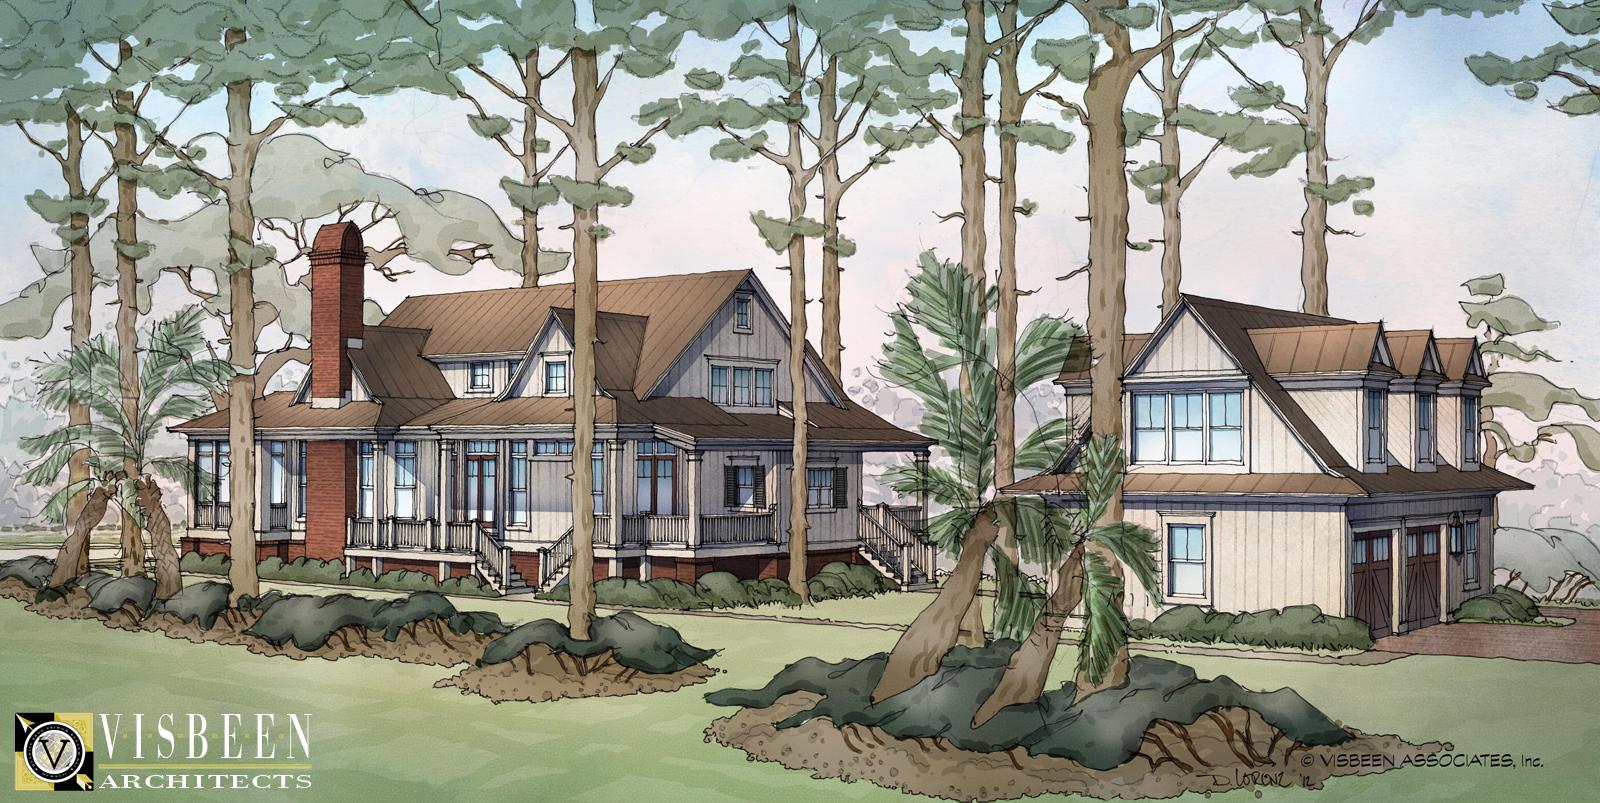 Laurel Visbeen Architects - Featured designer visbeen associates